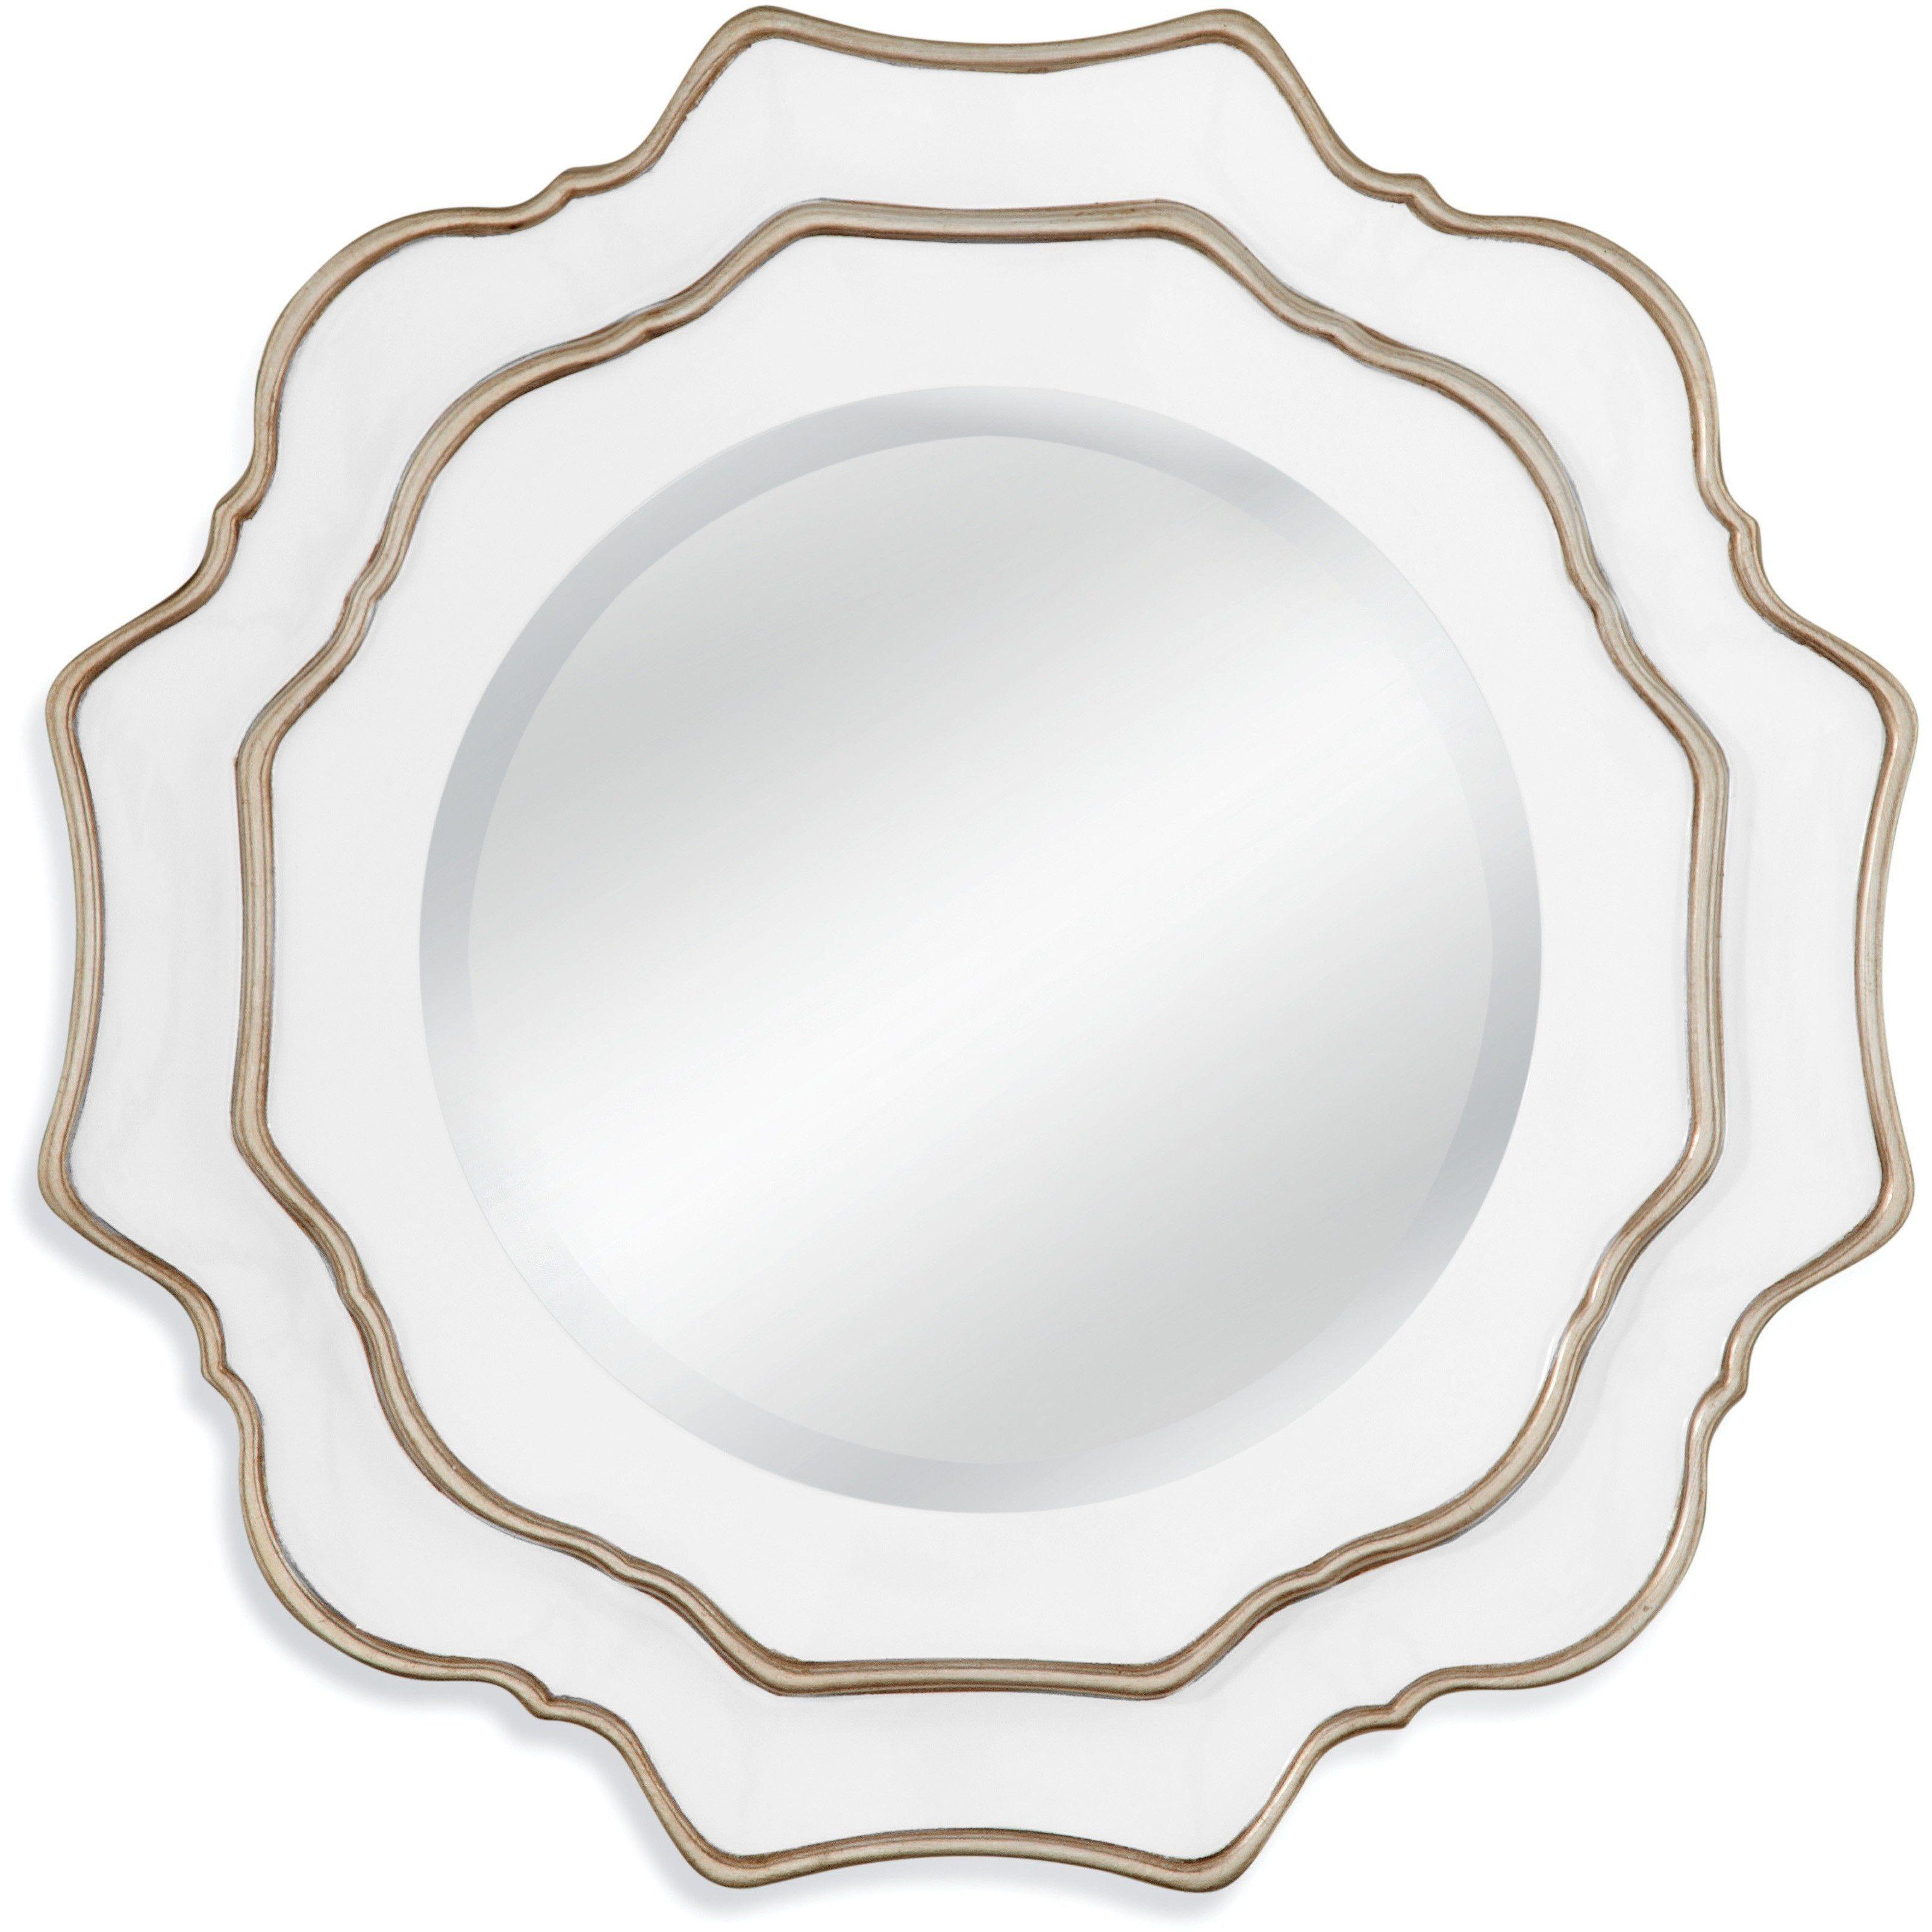 Bassett Mirror Tabitha Wall Mirror White Silver 30 Quot X 30